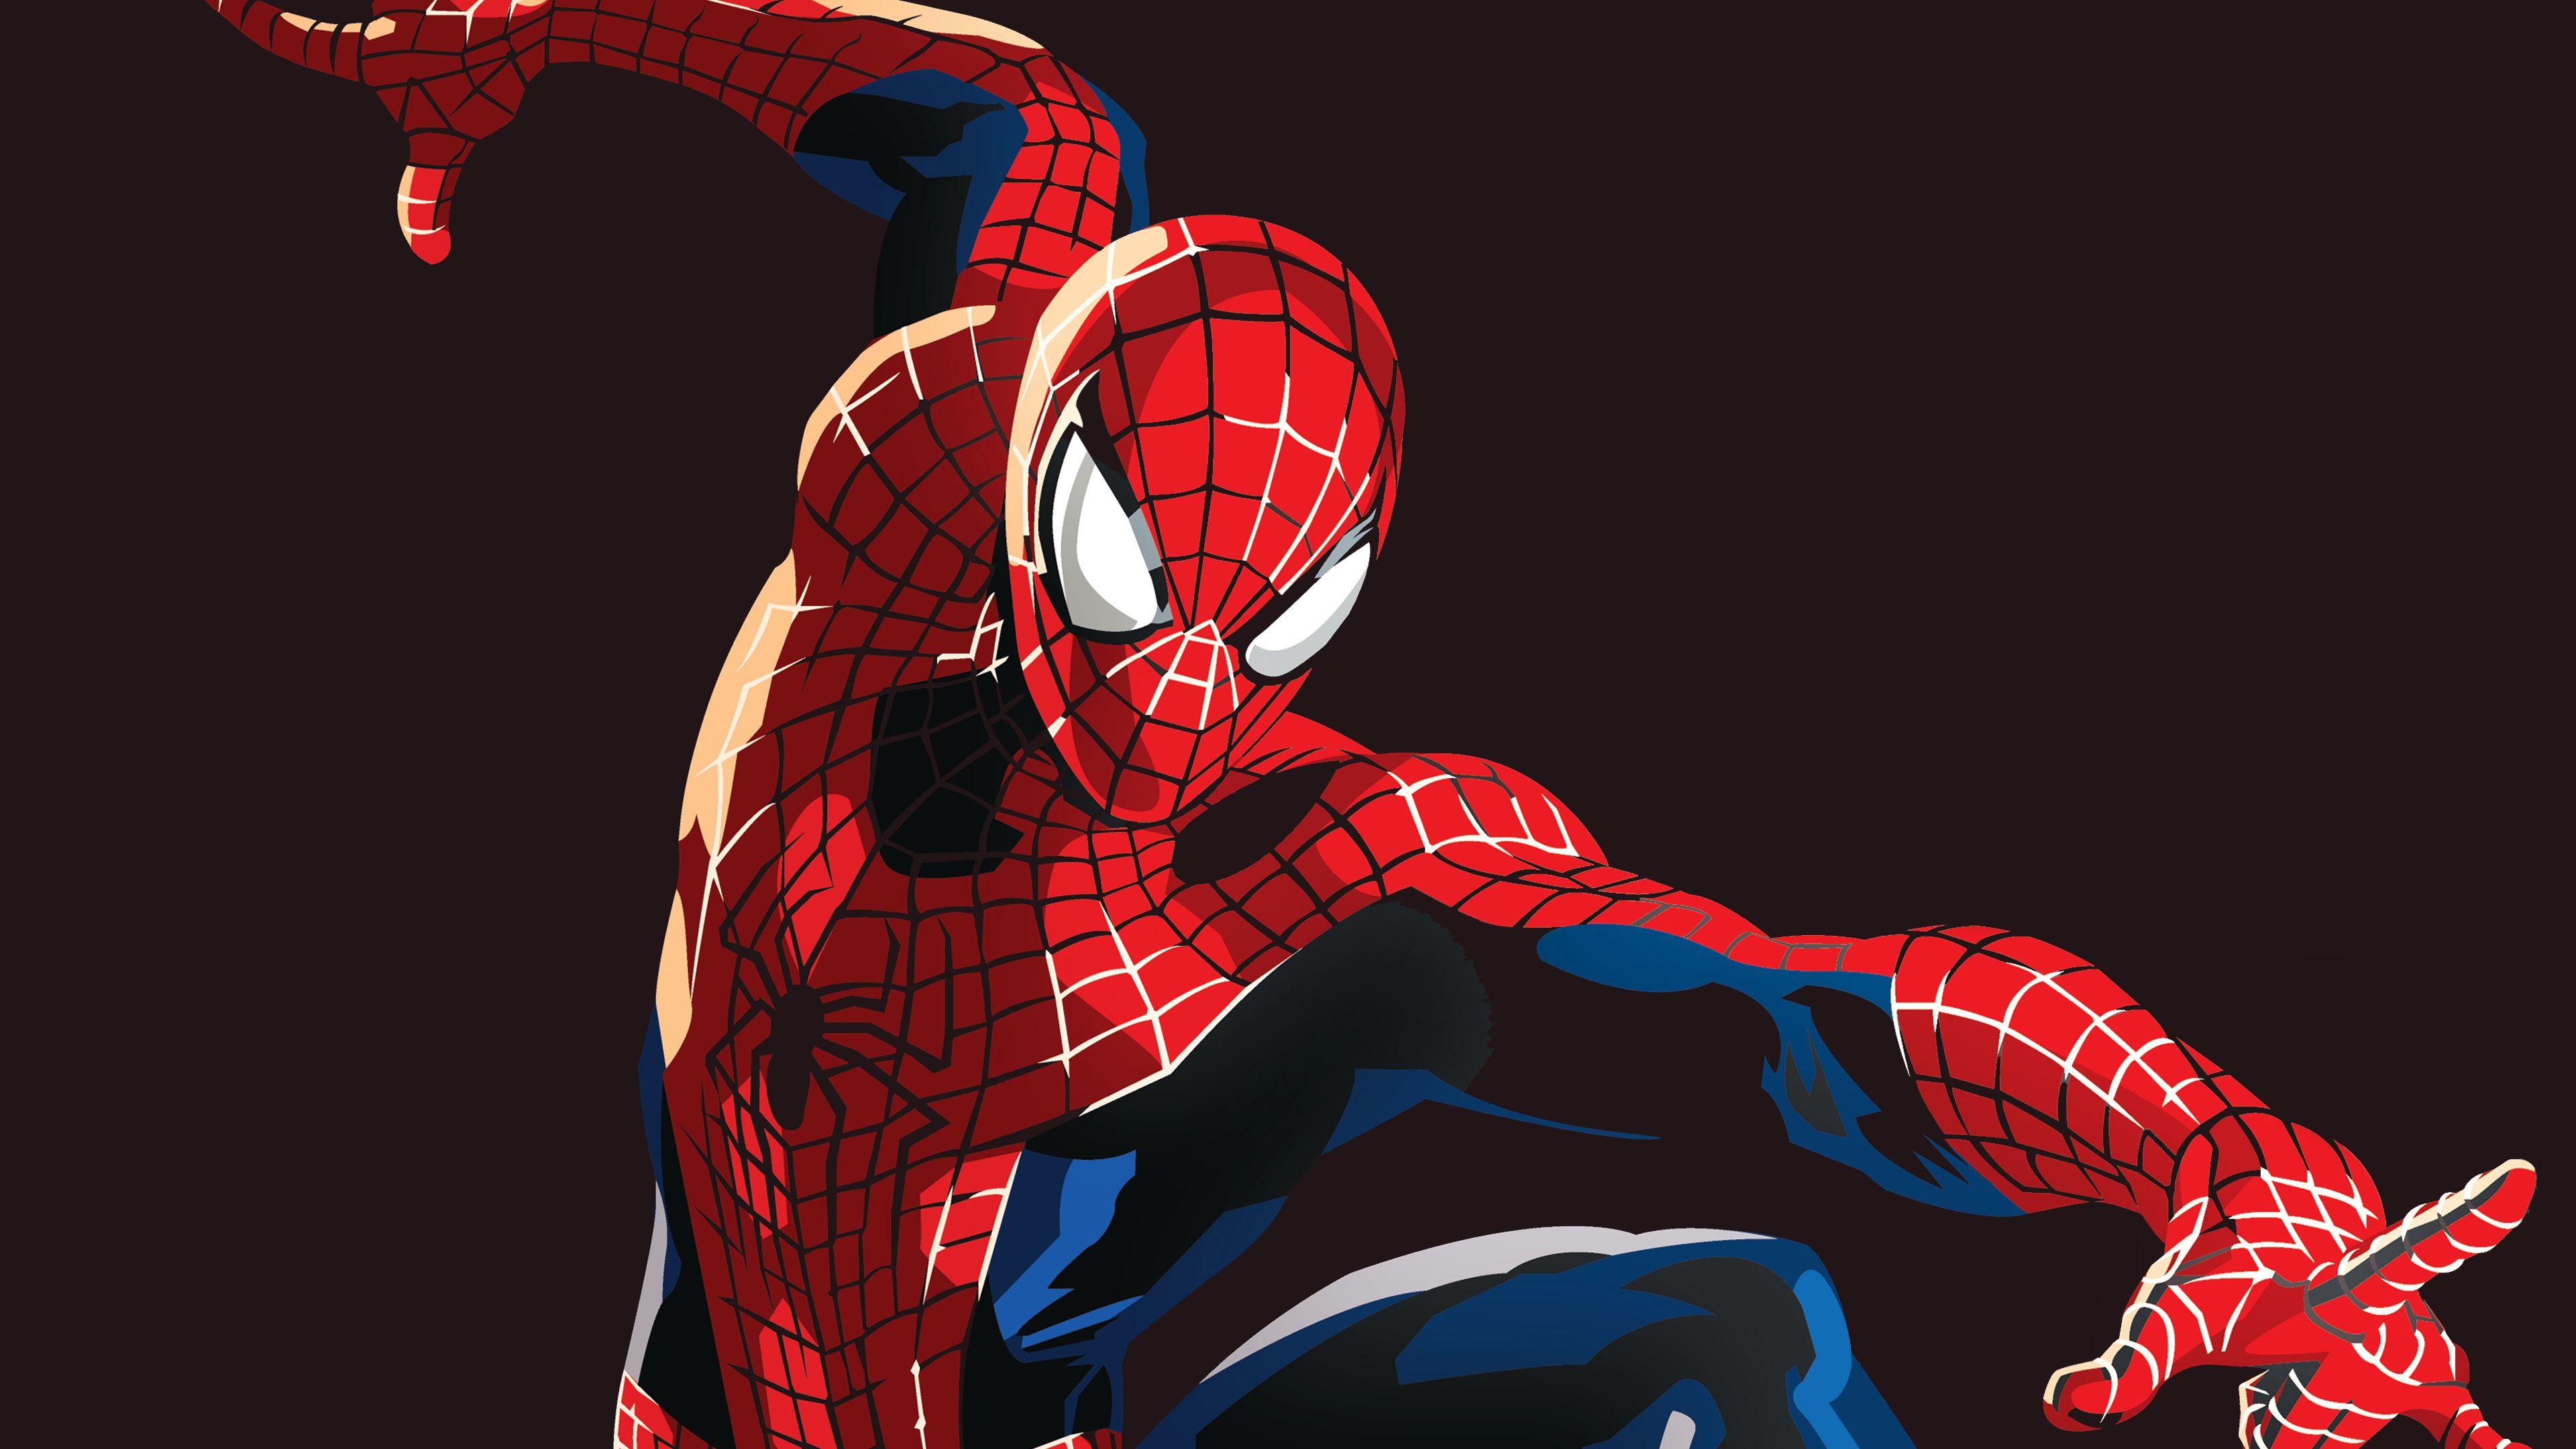 Wallpaper 4k Spiderman Graphic 4k 4kwallpapers, art